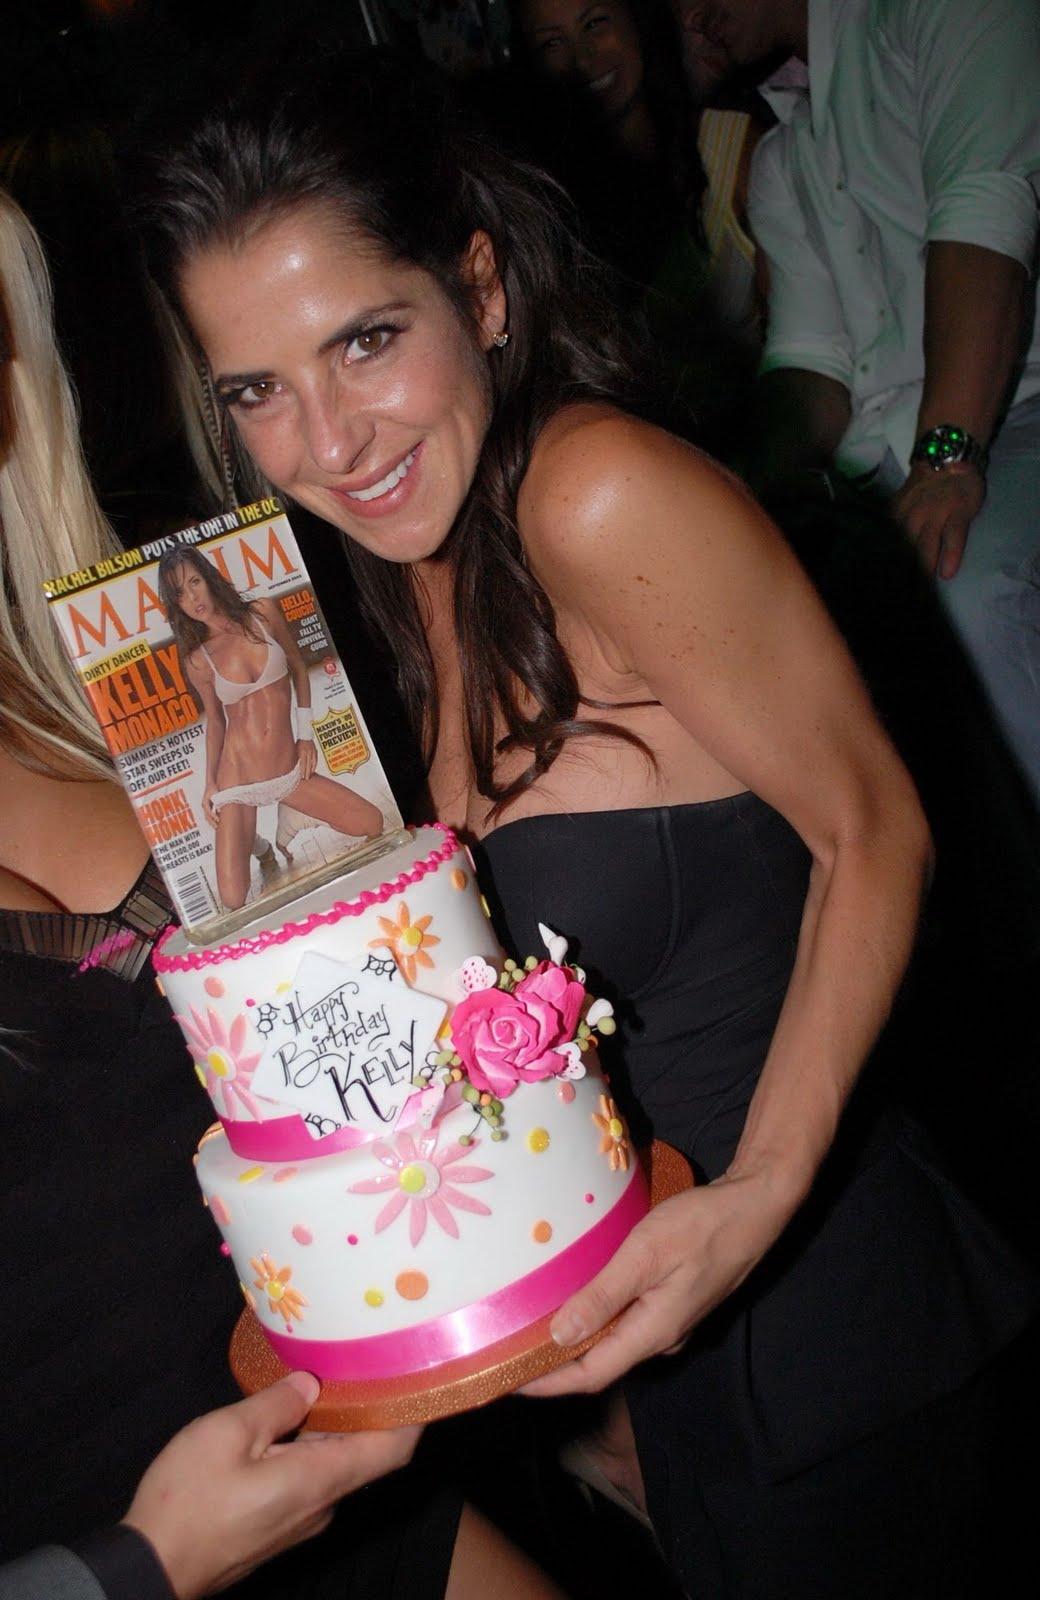 http://4.bp.blogspot.com/-JQPrNhopV1c/TgCKs7ShcbI/AAAAAAAAQU8/usnzcf_DbNg/s1600/Kelley+Monaco+w+cake%255B1%255D.jpg